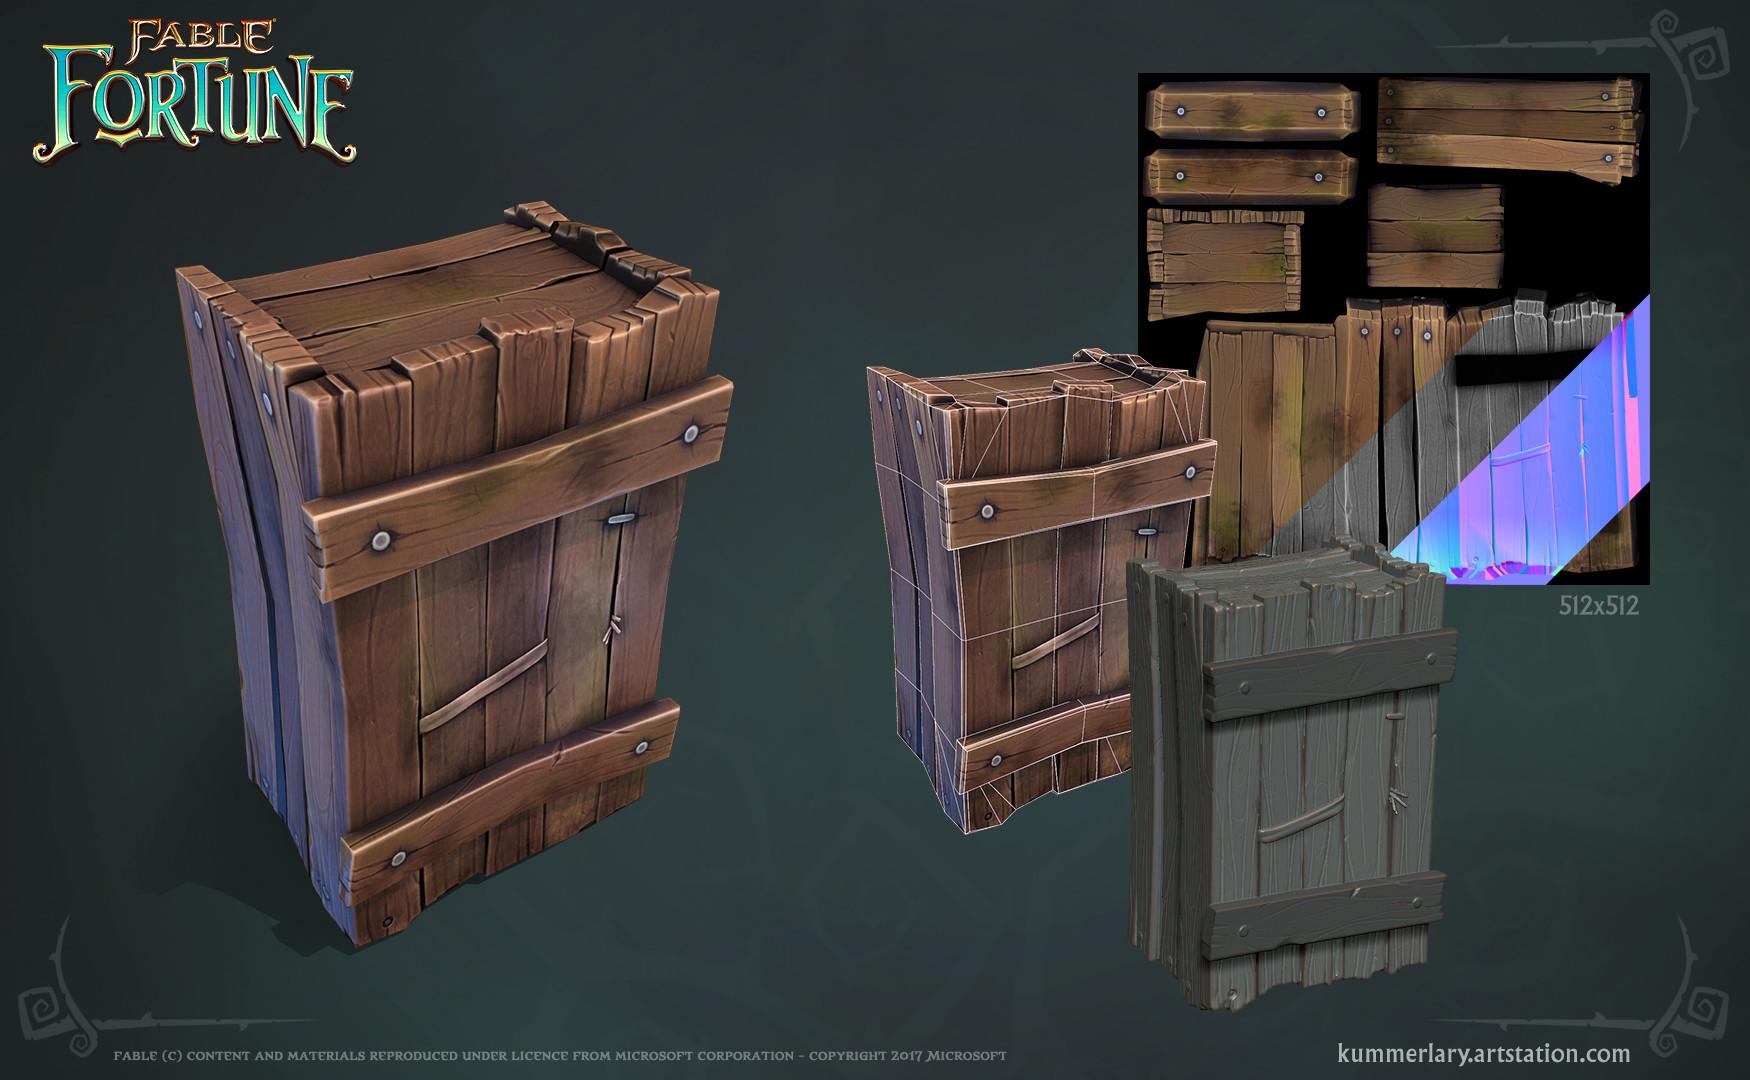 Lary kummer fablefortune crate